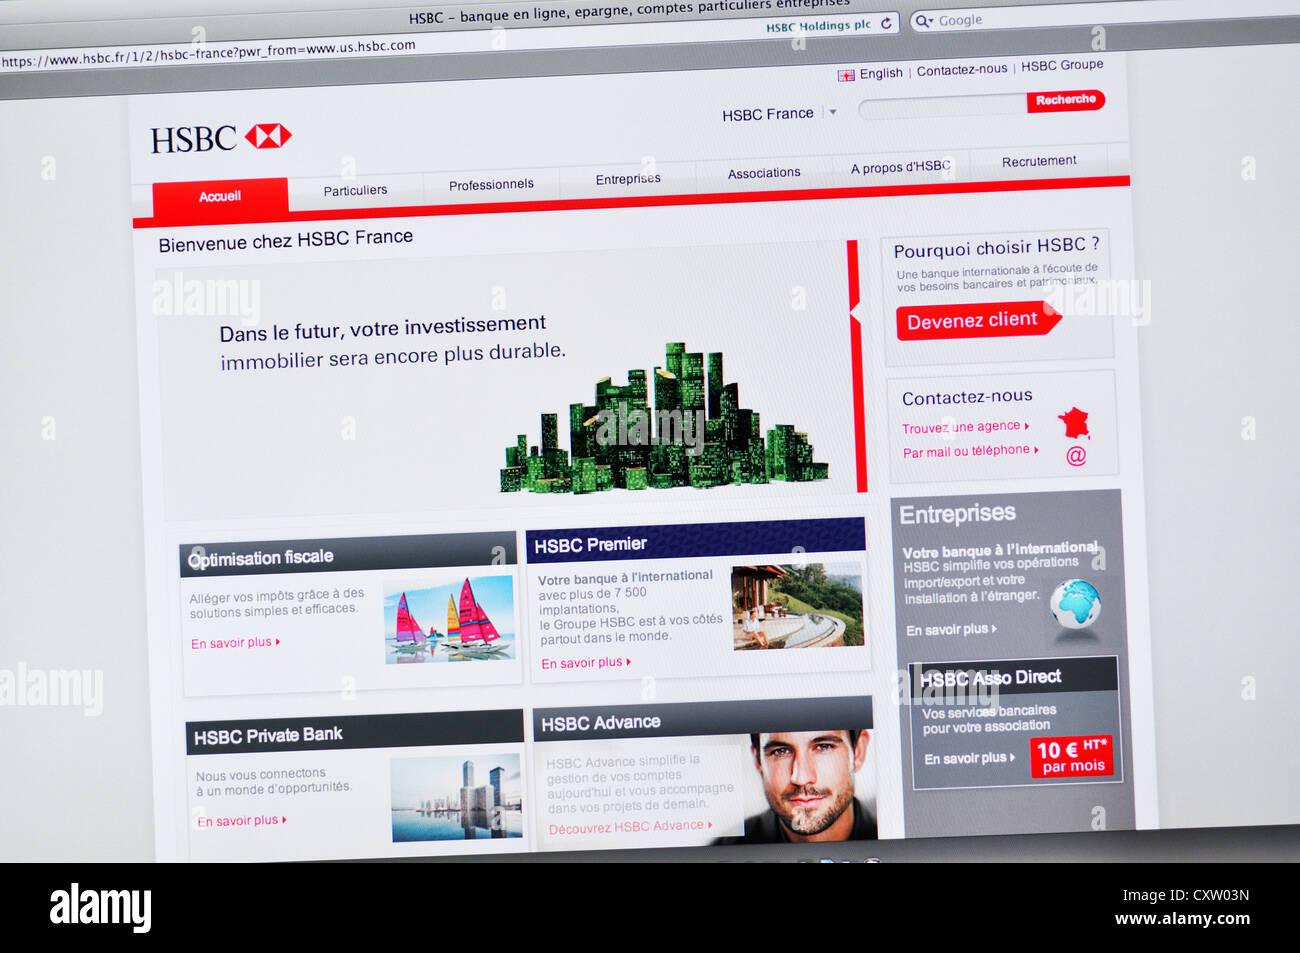 HSBC bank France website - online banking Stock Photo